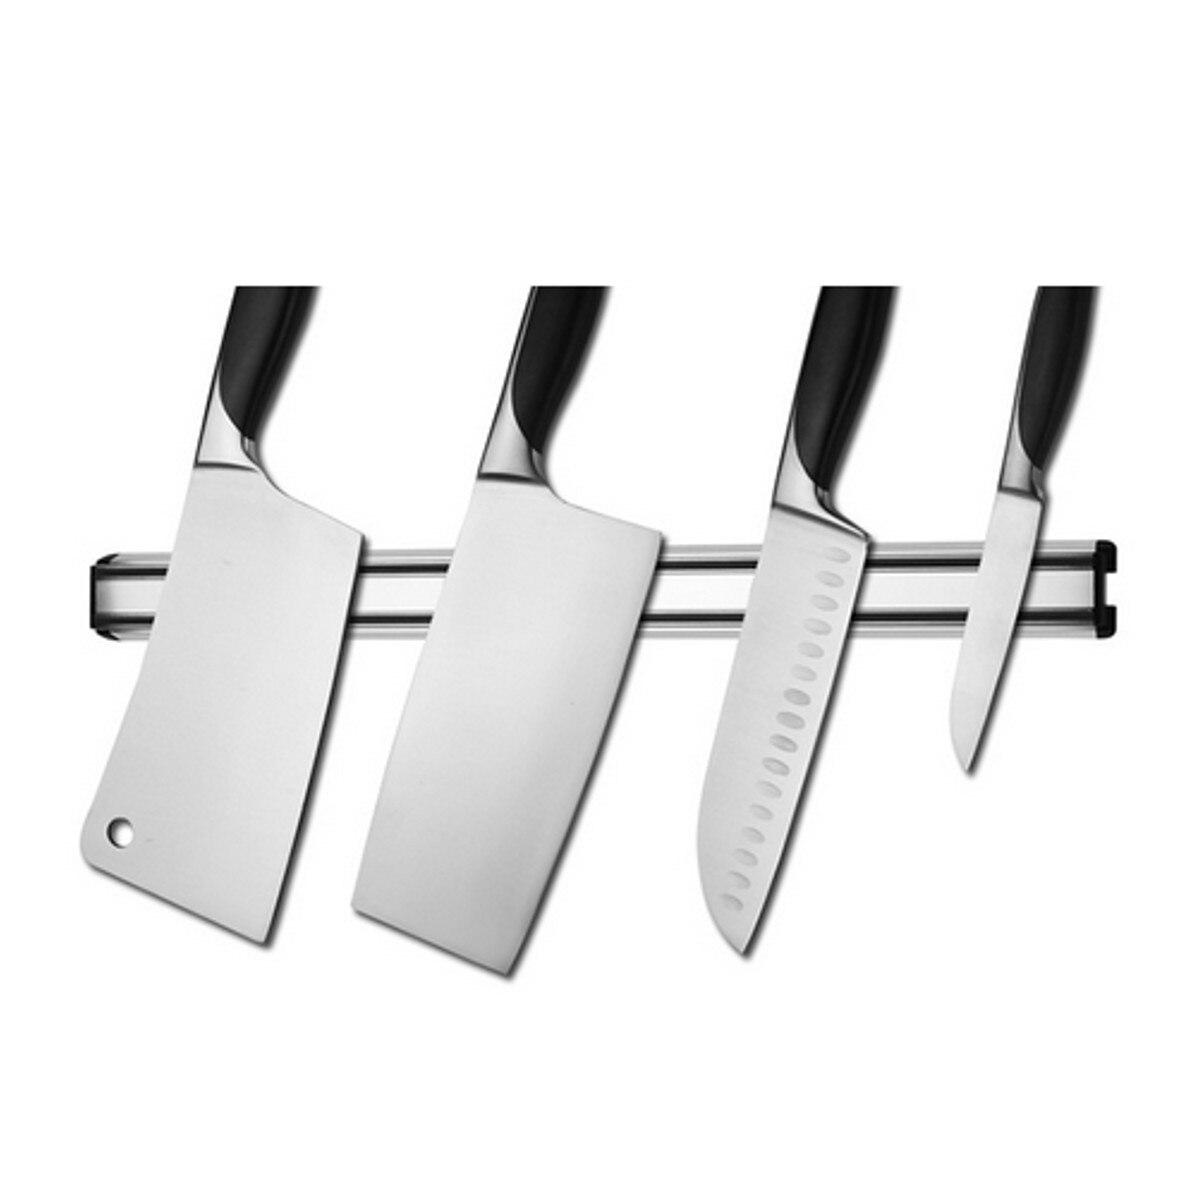 Hanging utensil rack for kitchen - Wall Mount Magnetic Knife Scissor Storage Holder Chef Rack Strip Utensil For Kitchen Knife Blocks Kitchen